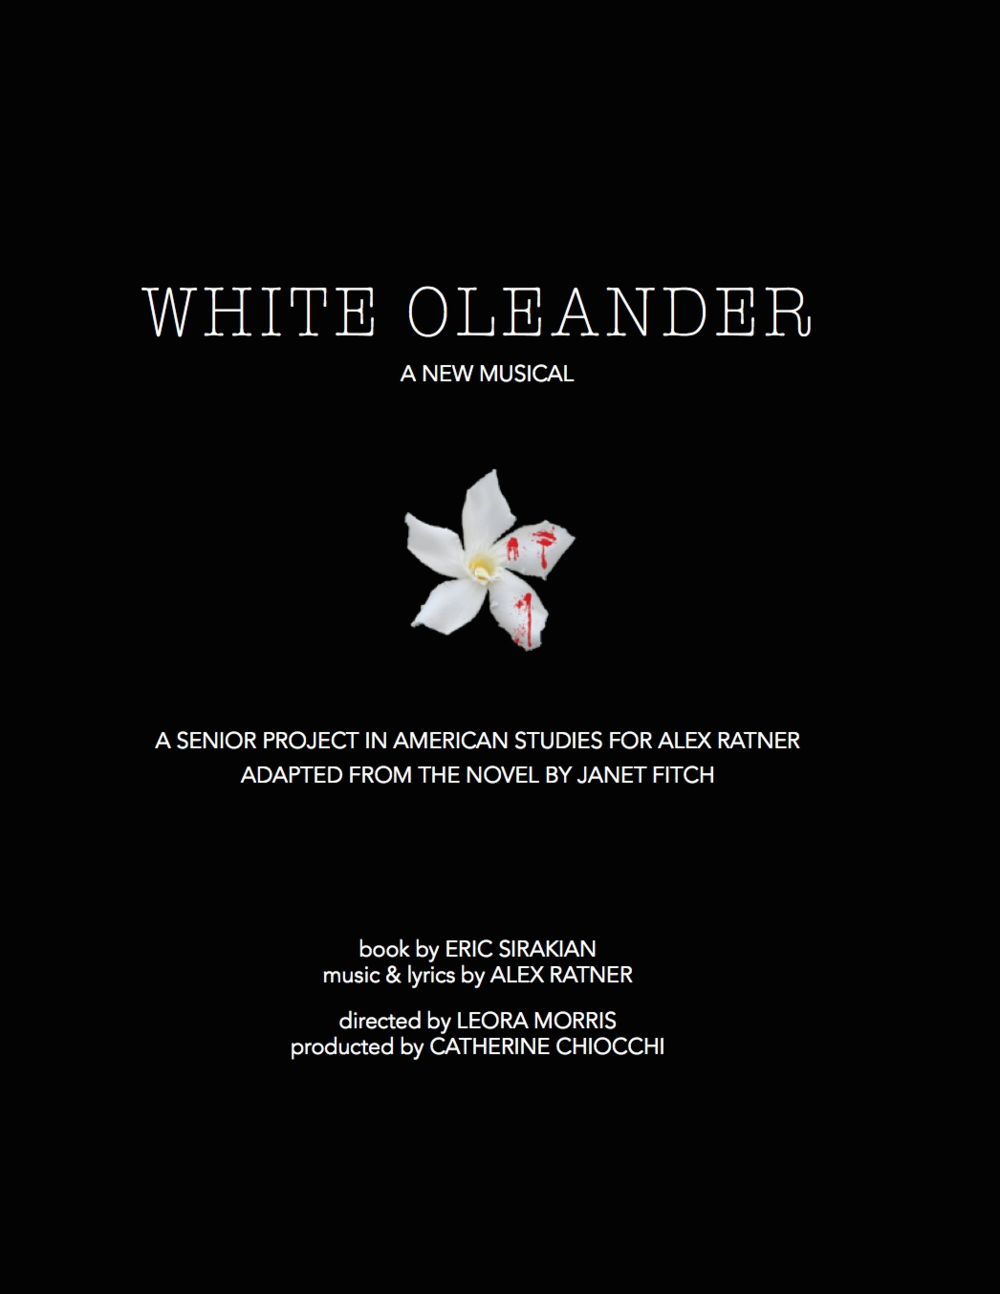 WhiteOleander2015Poster